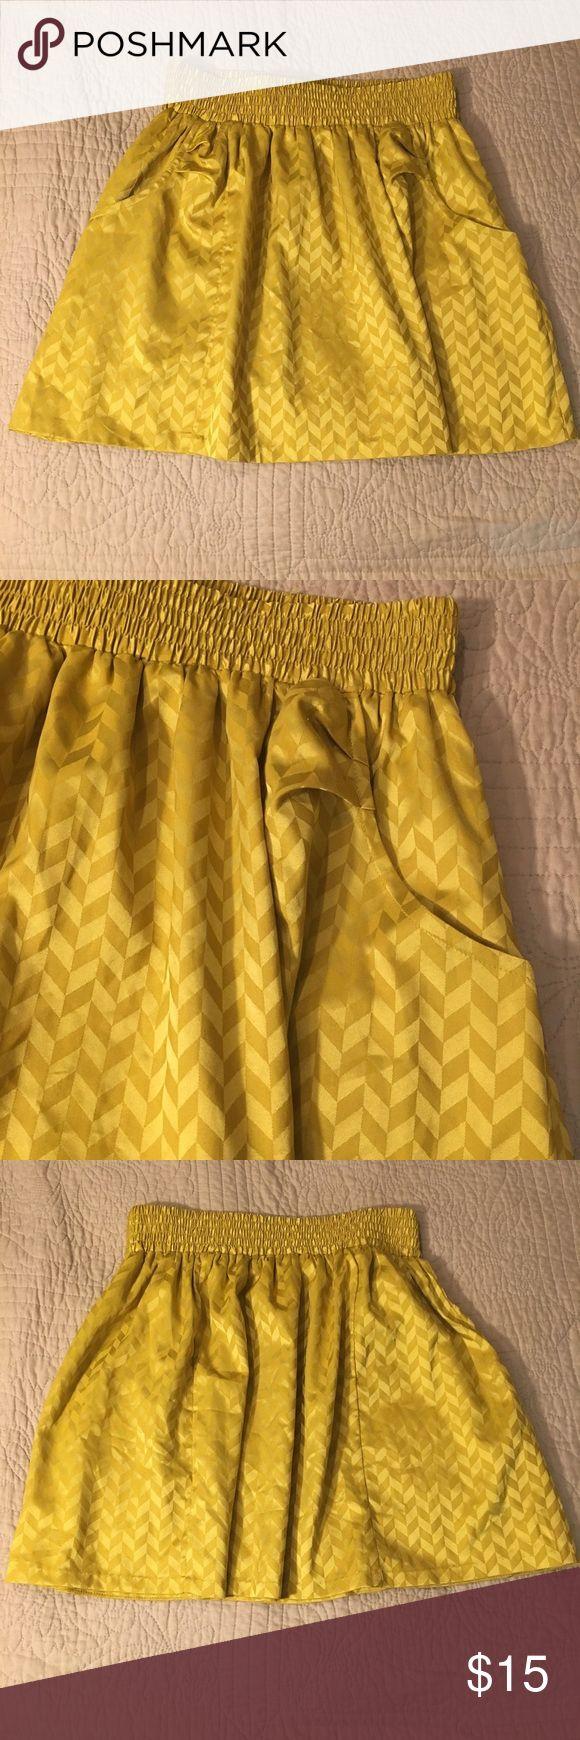 Pattern Yellow And Navy Chevron